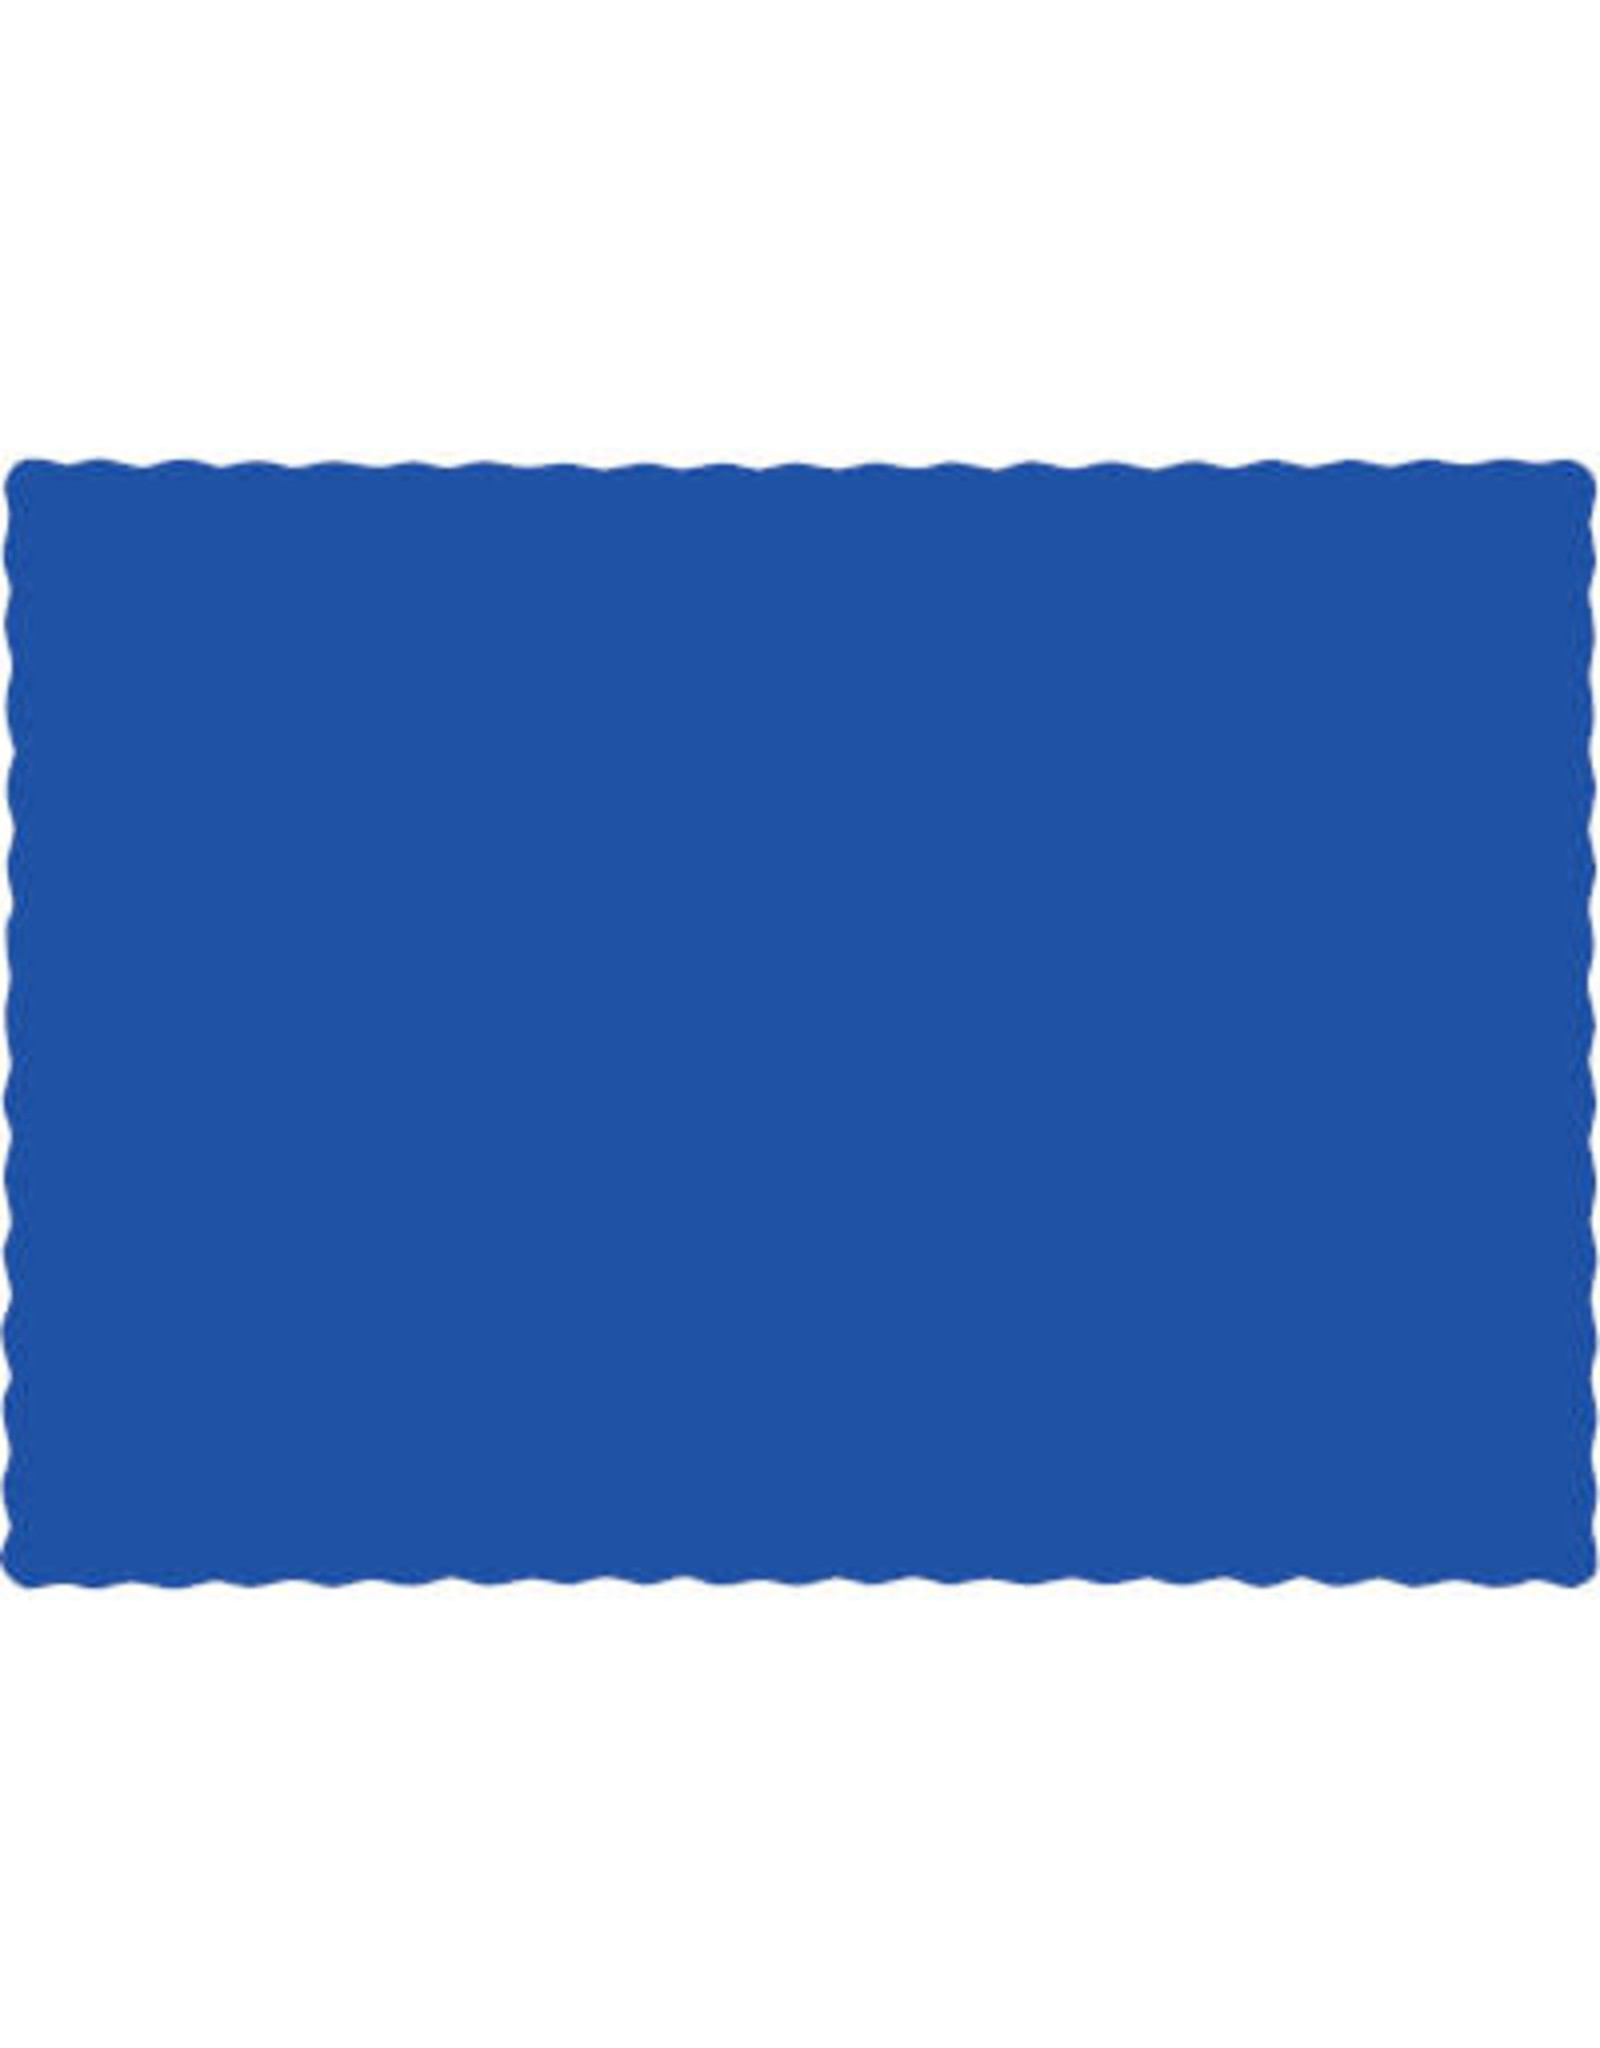 Touch of Color COBALT BLUE PLACEMATS